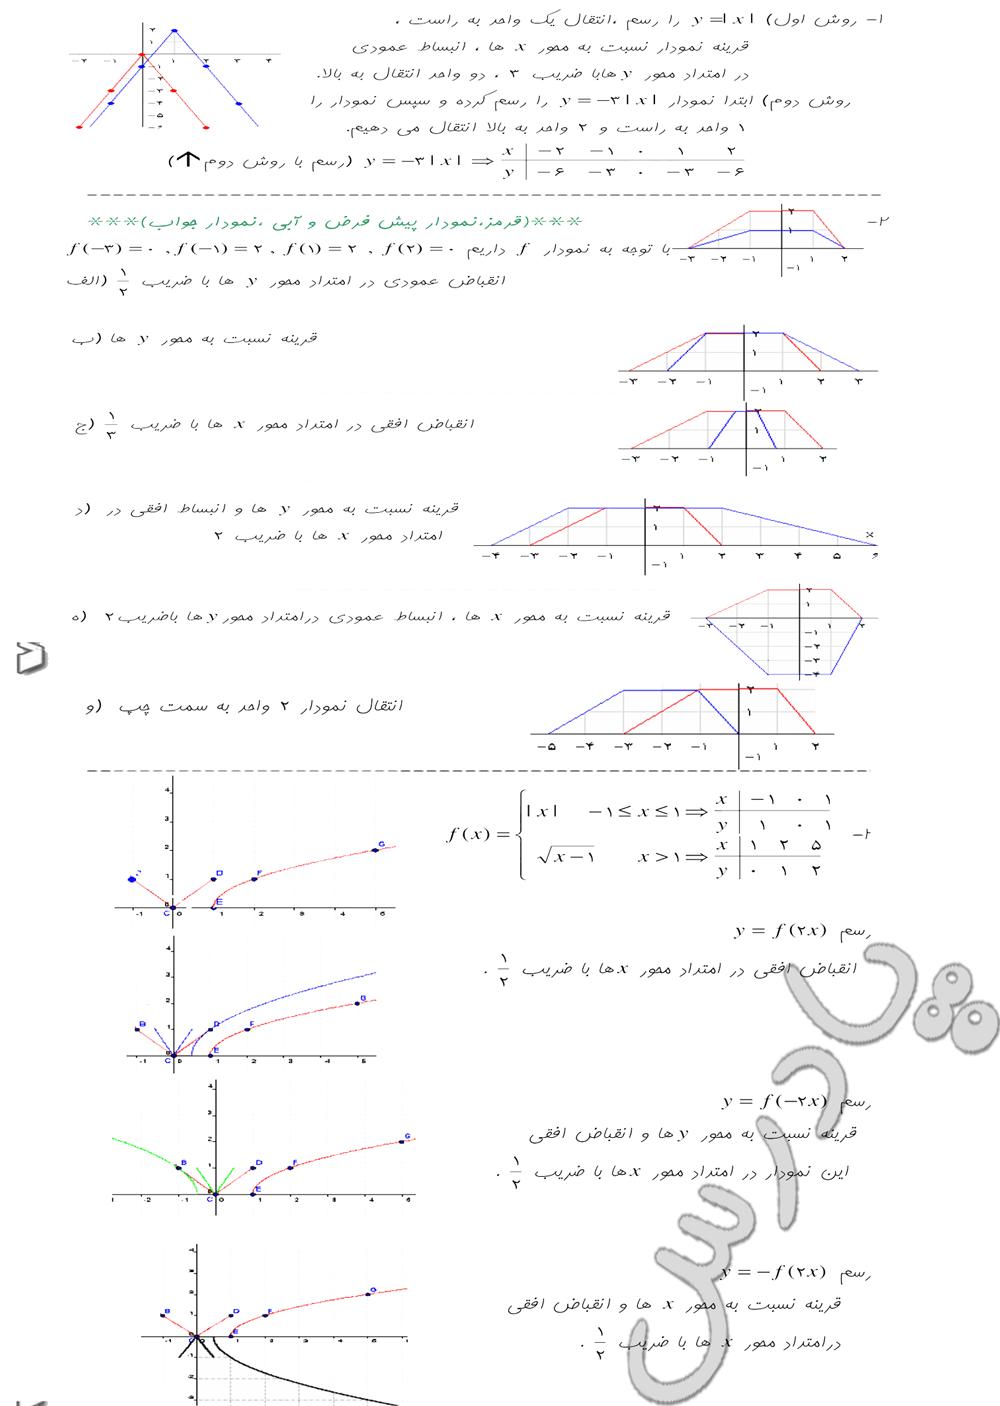 حل مسائل صفحه 63 فصل دوم حسابان سال سوم